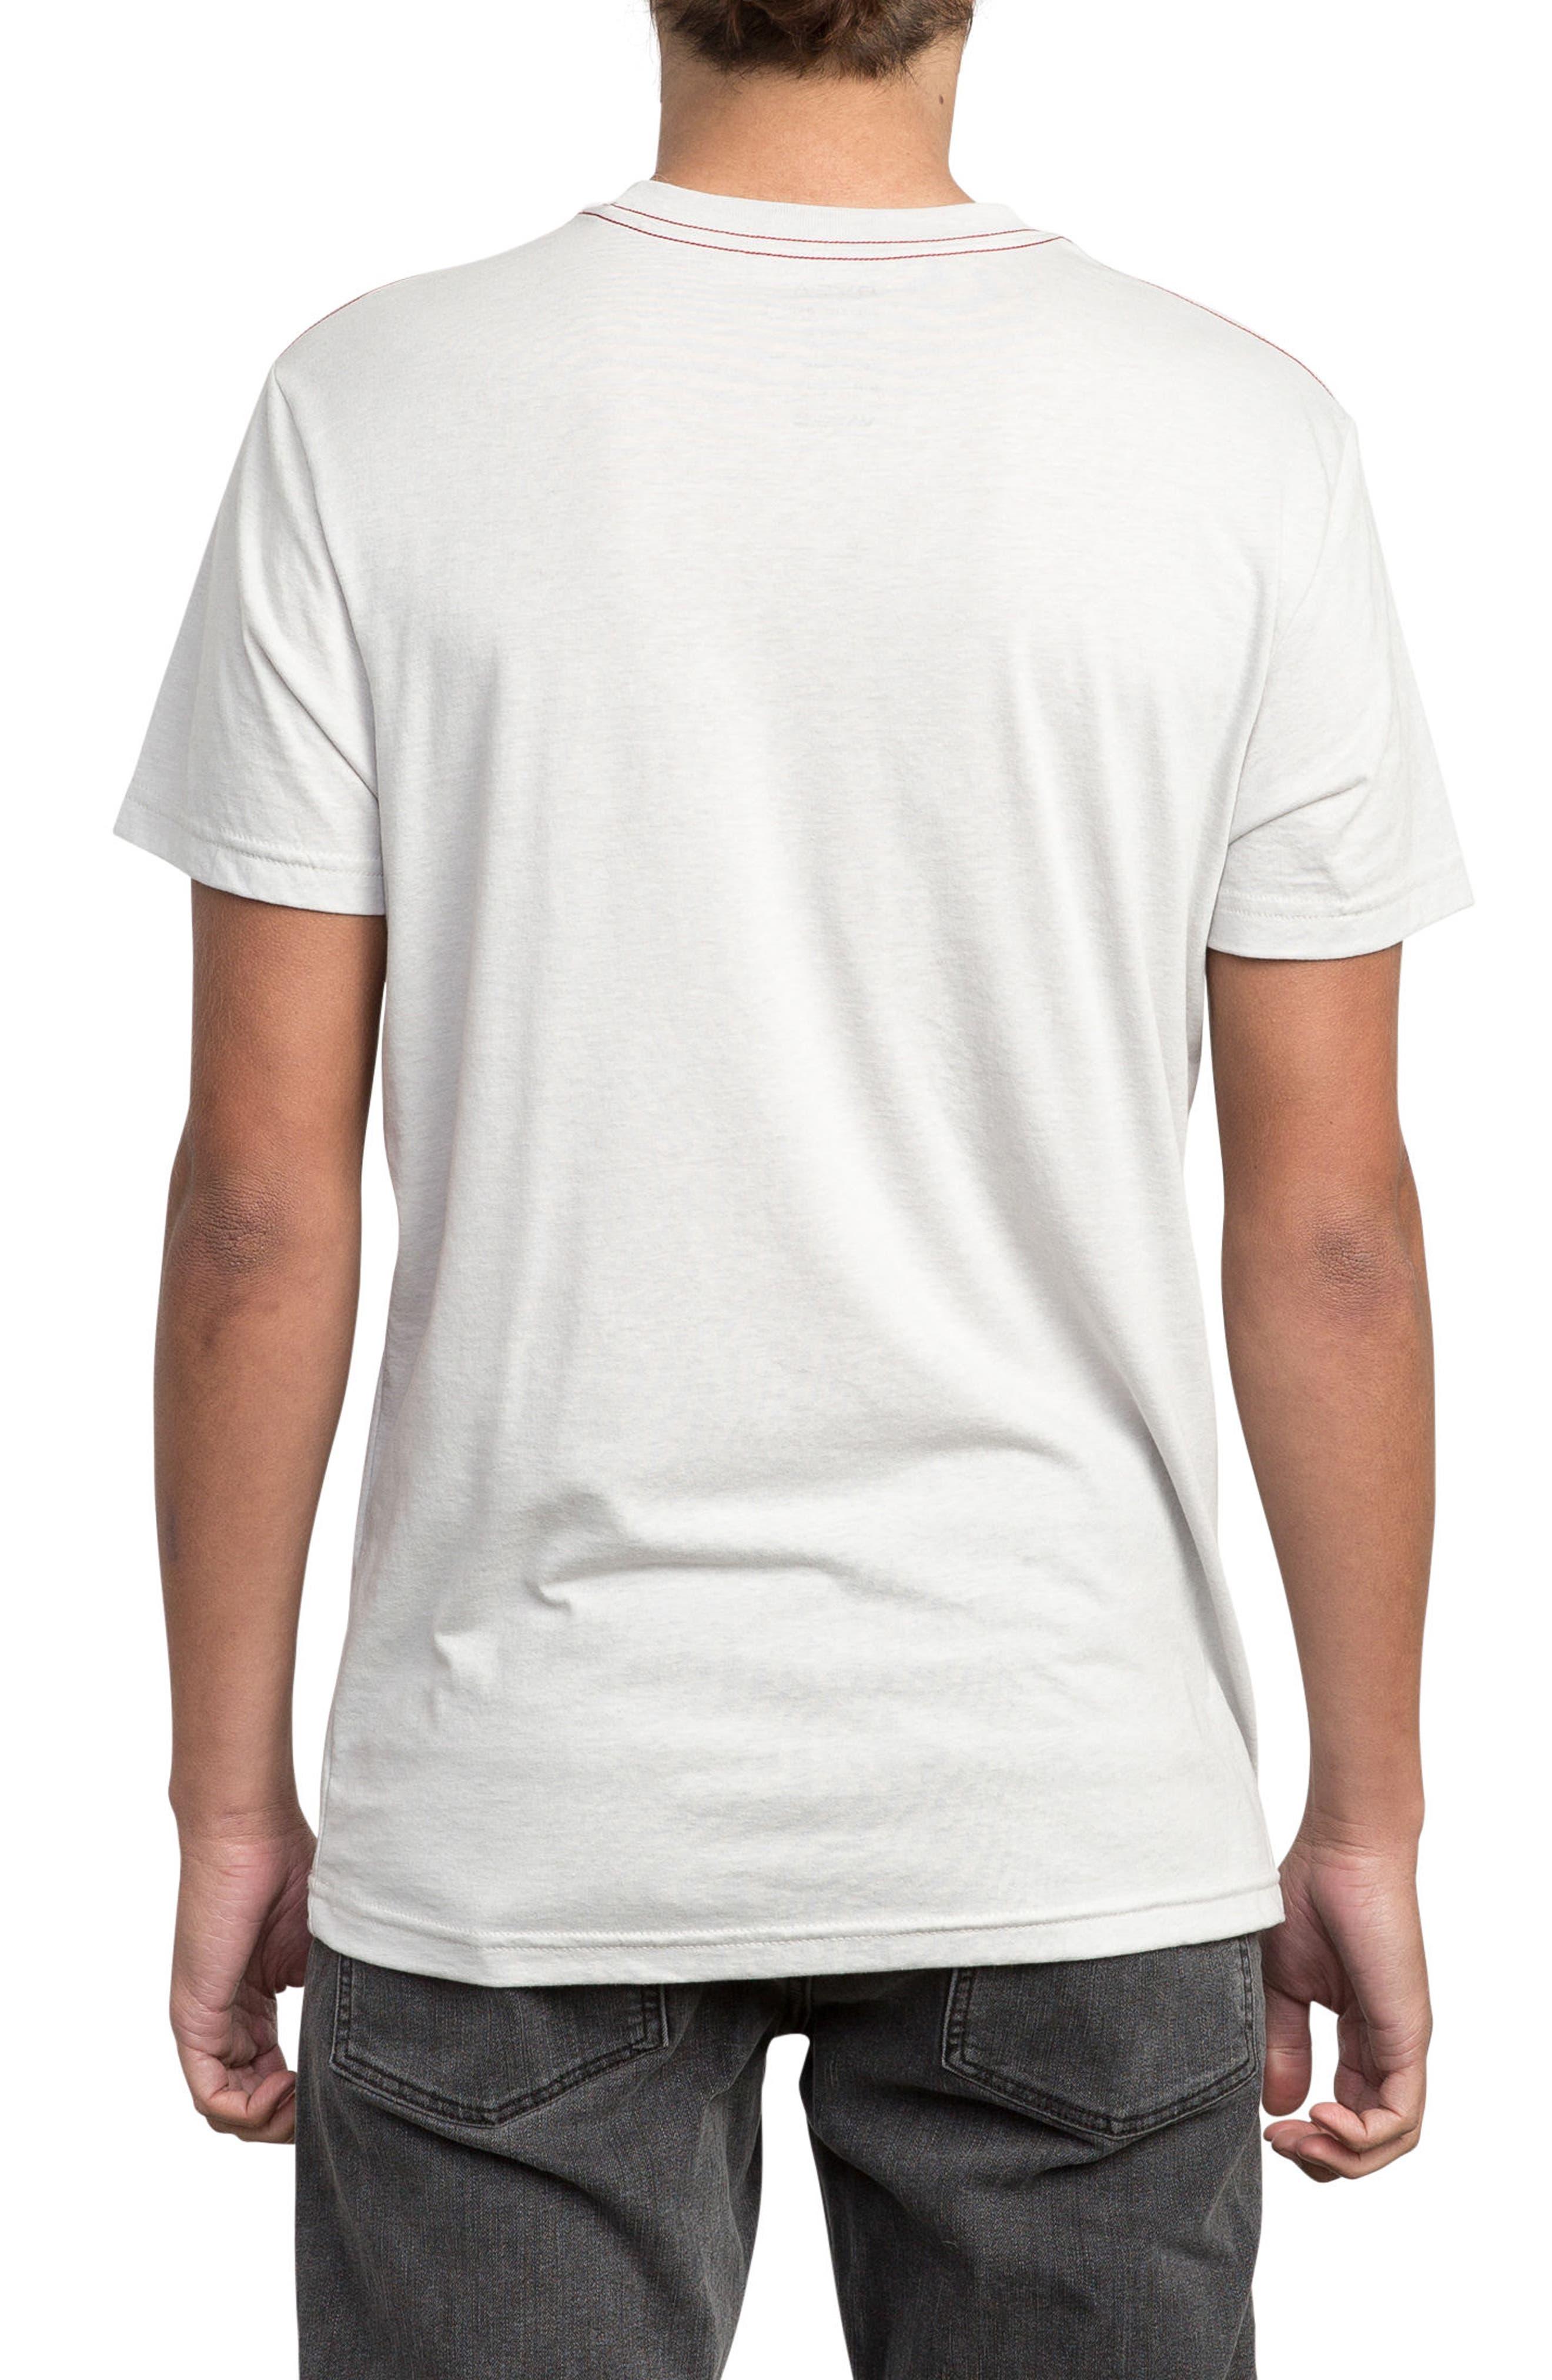 McFloral T-Shirt,                             Alternate thumbnail 2, color,                             WARM GREY